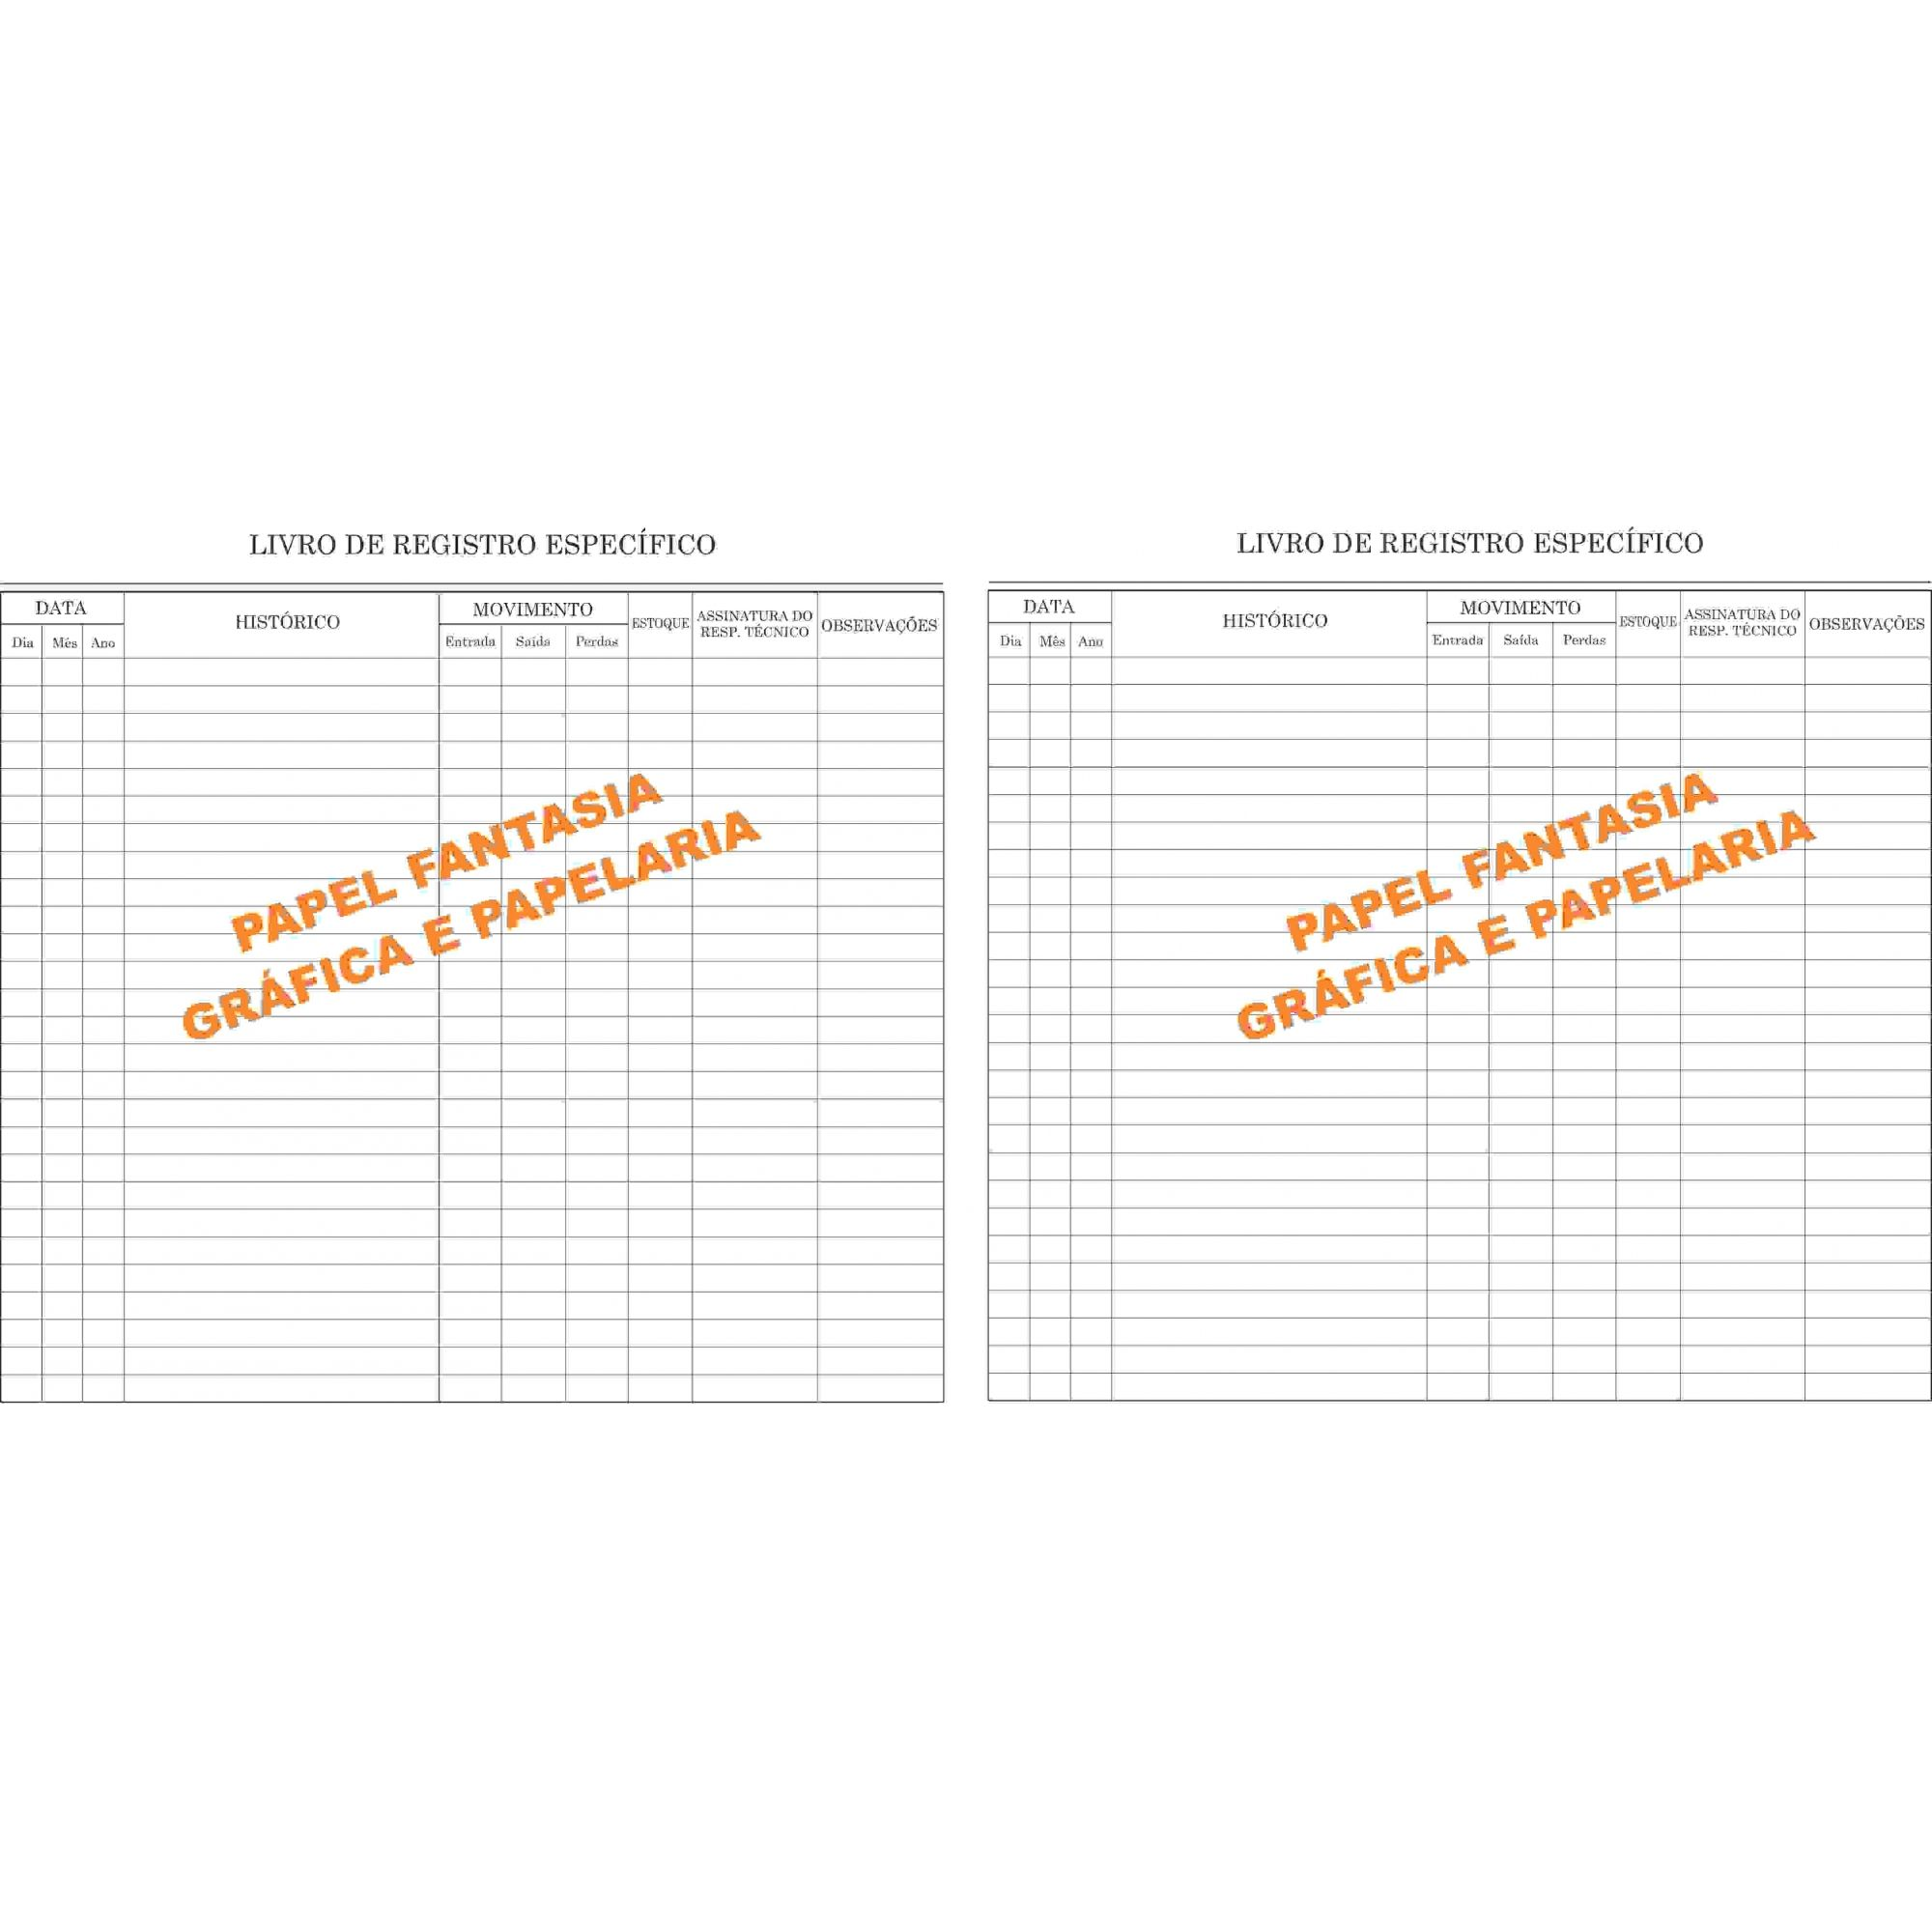 Livro de Registro Específico -  100 Folhas (Papelfantasia)